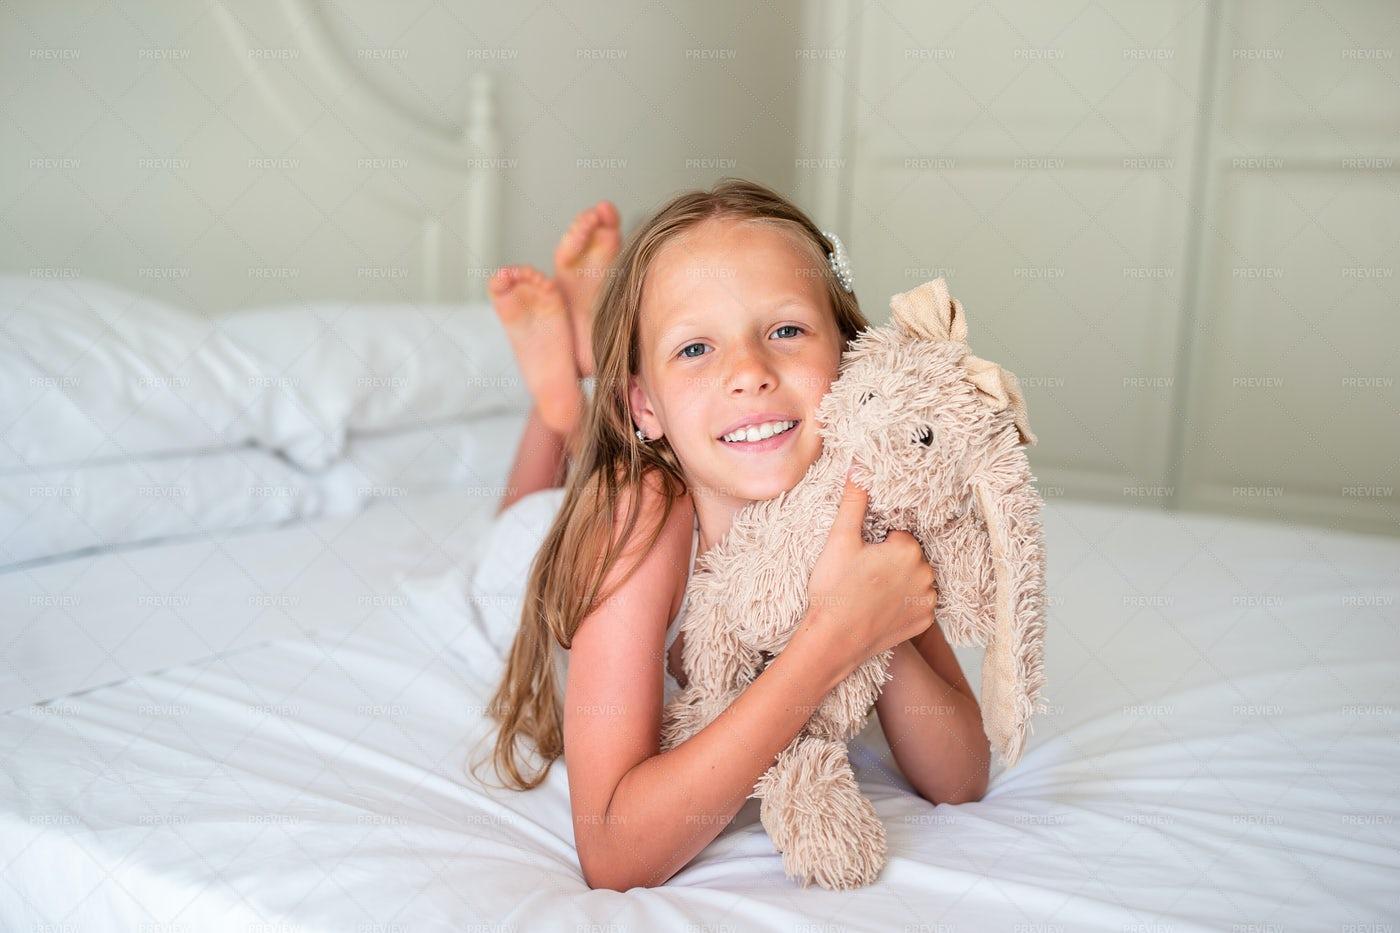 Girl With Stuffed Rabbit Toy: Stock Photos